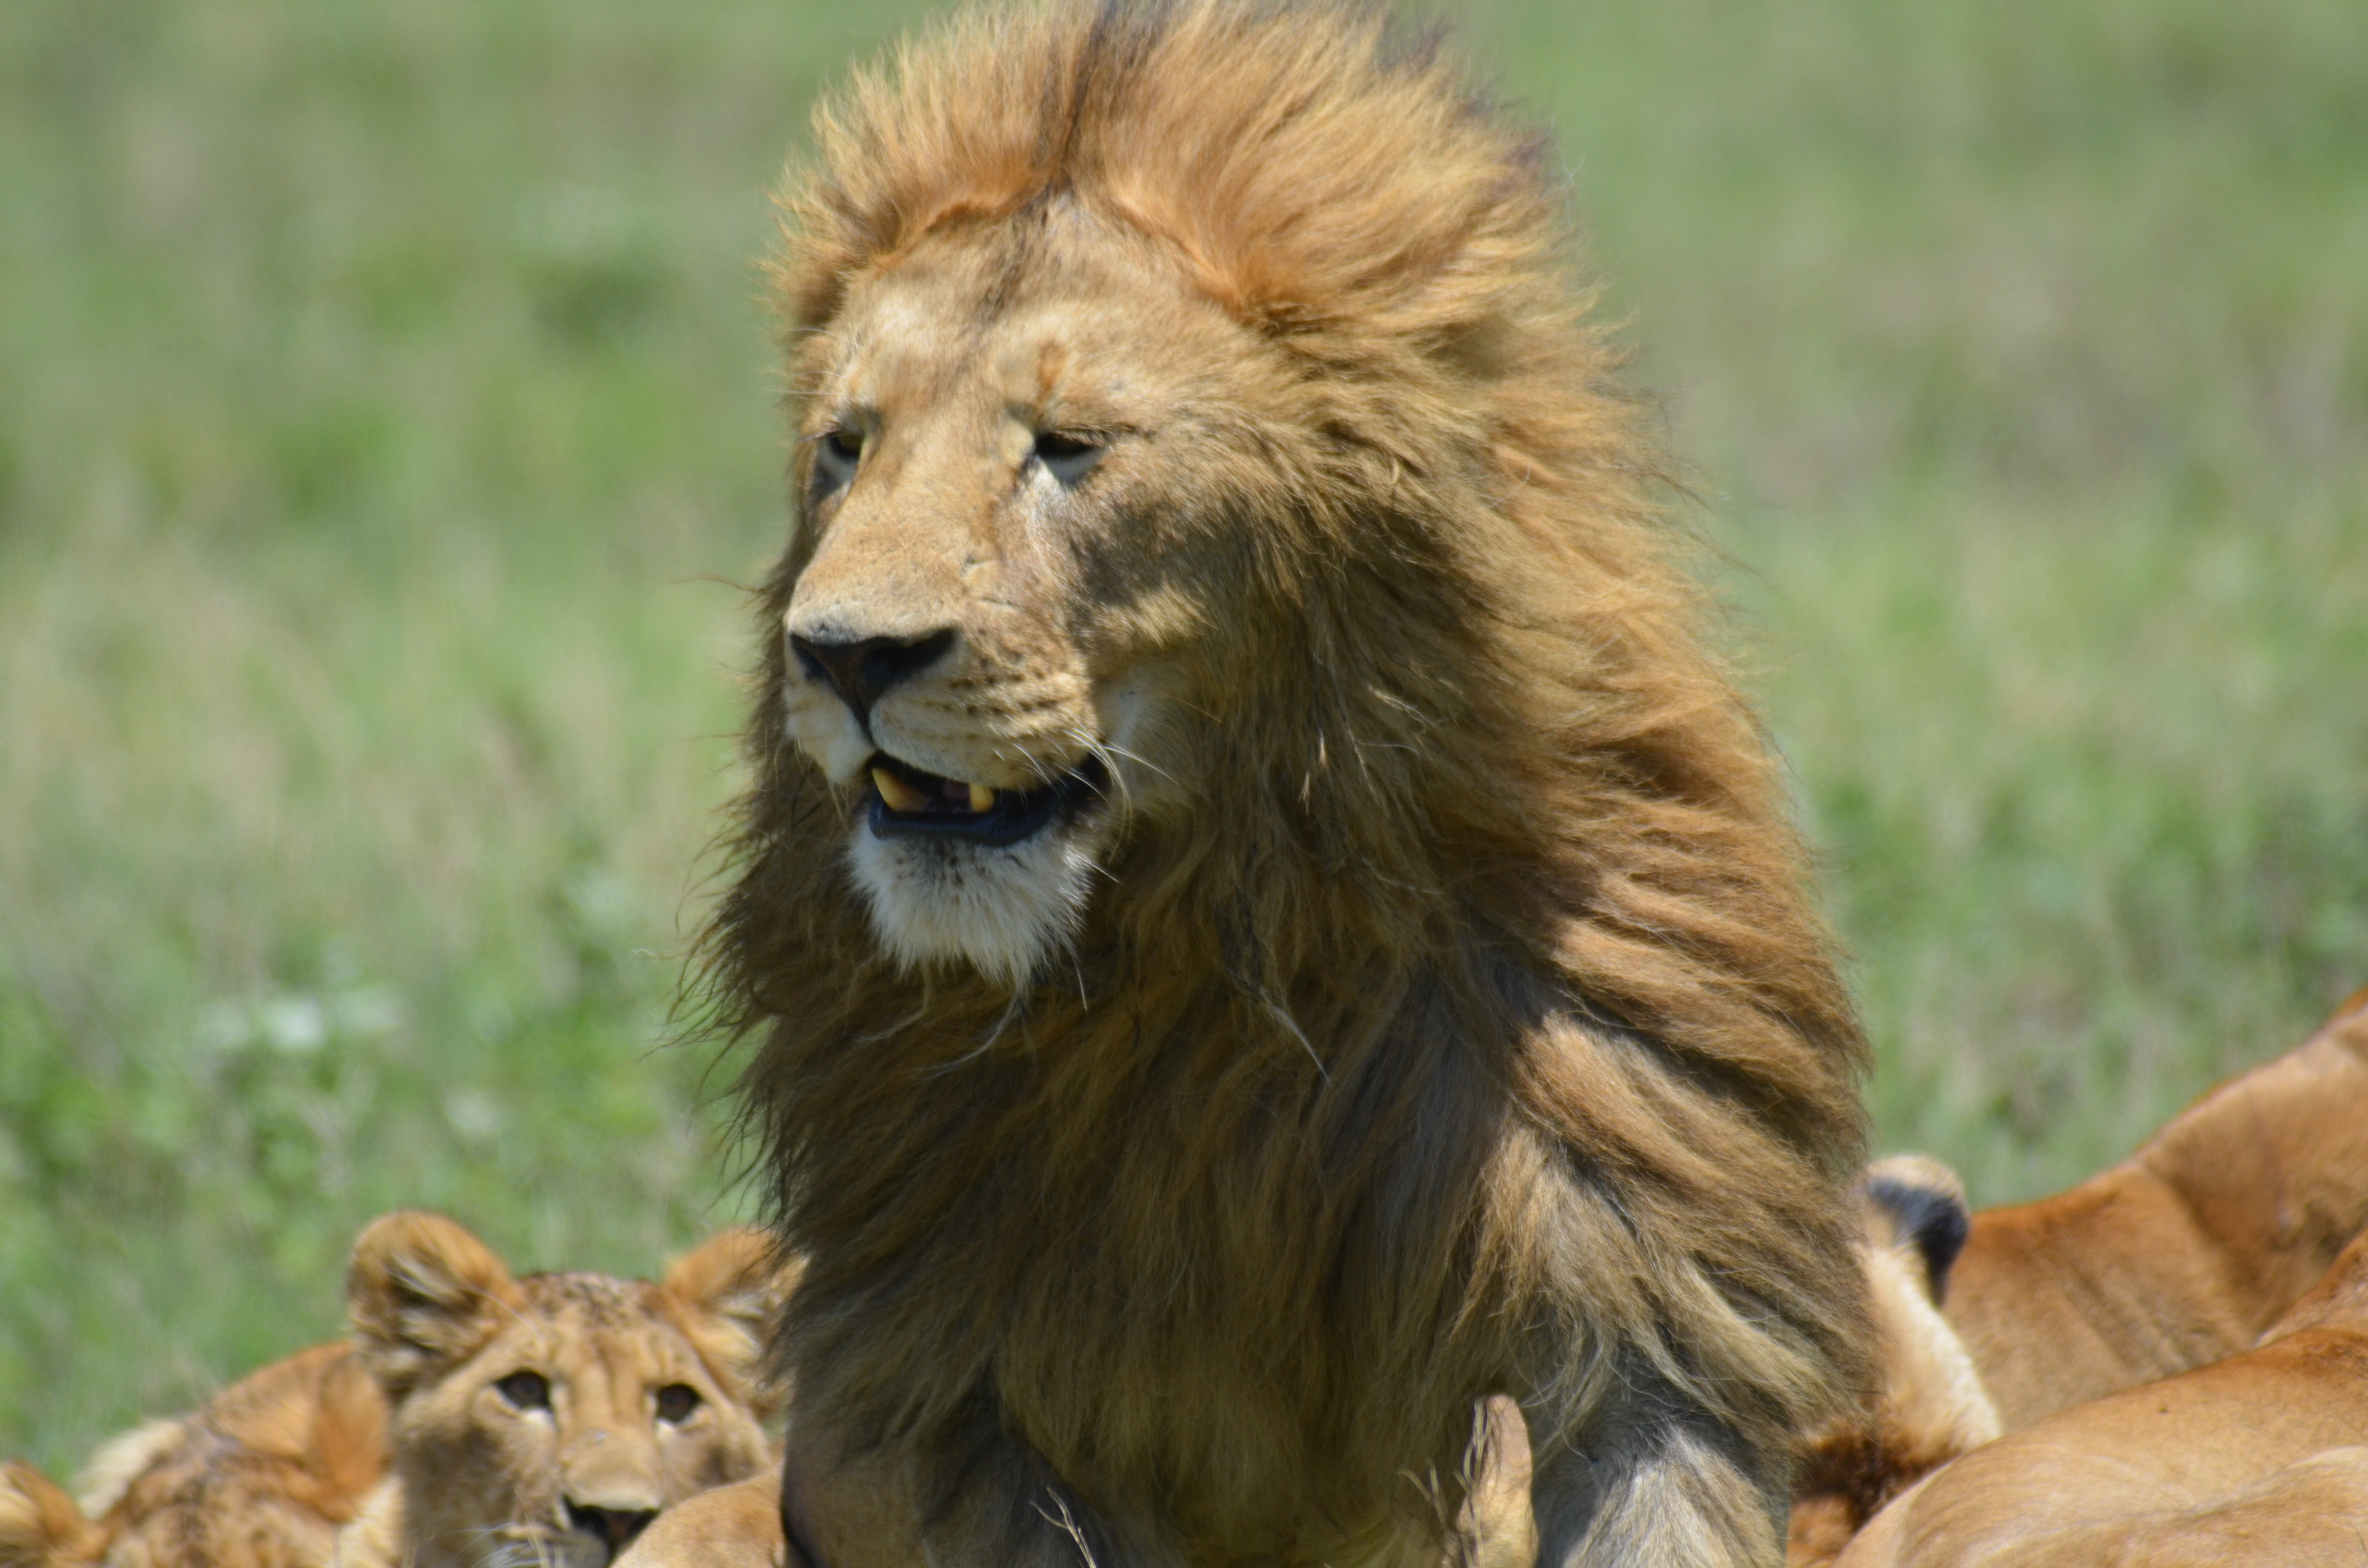 Lion sitting - photo#16